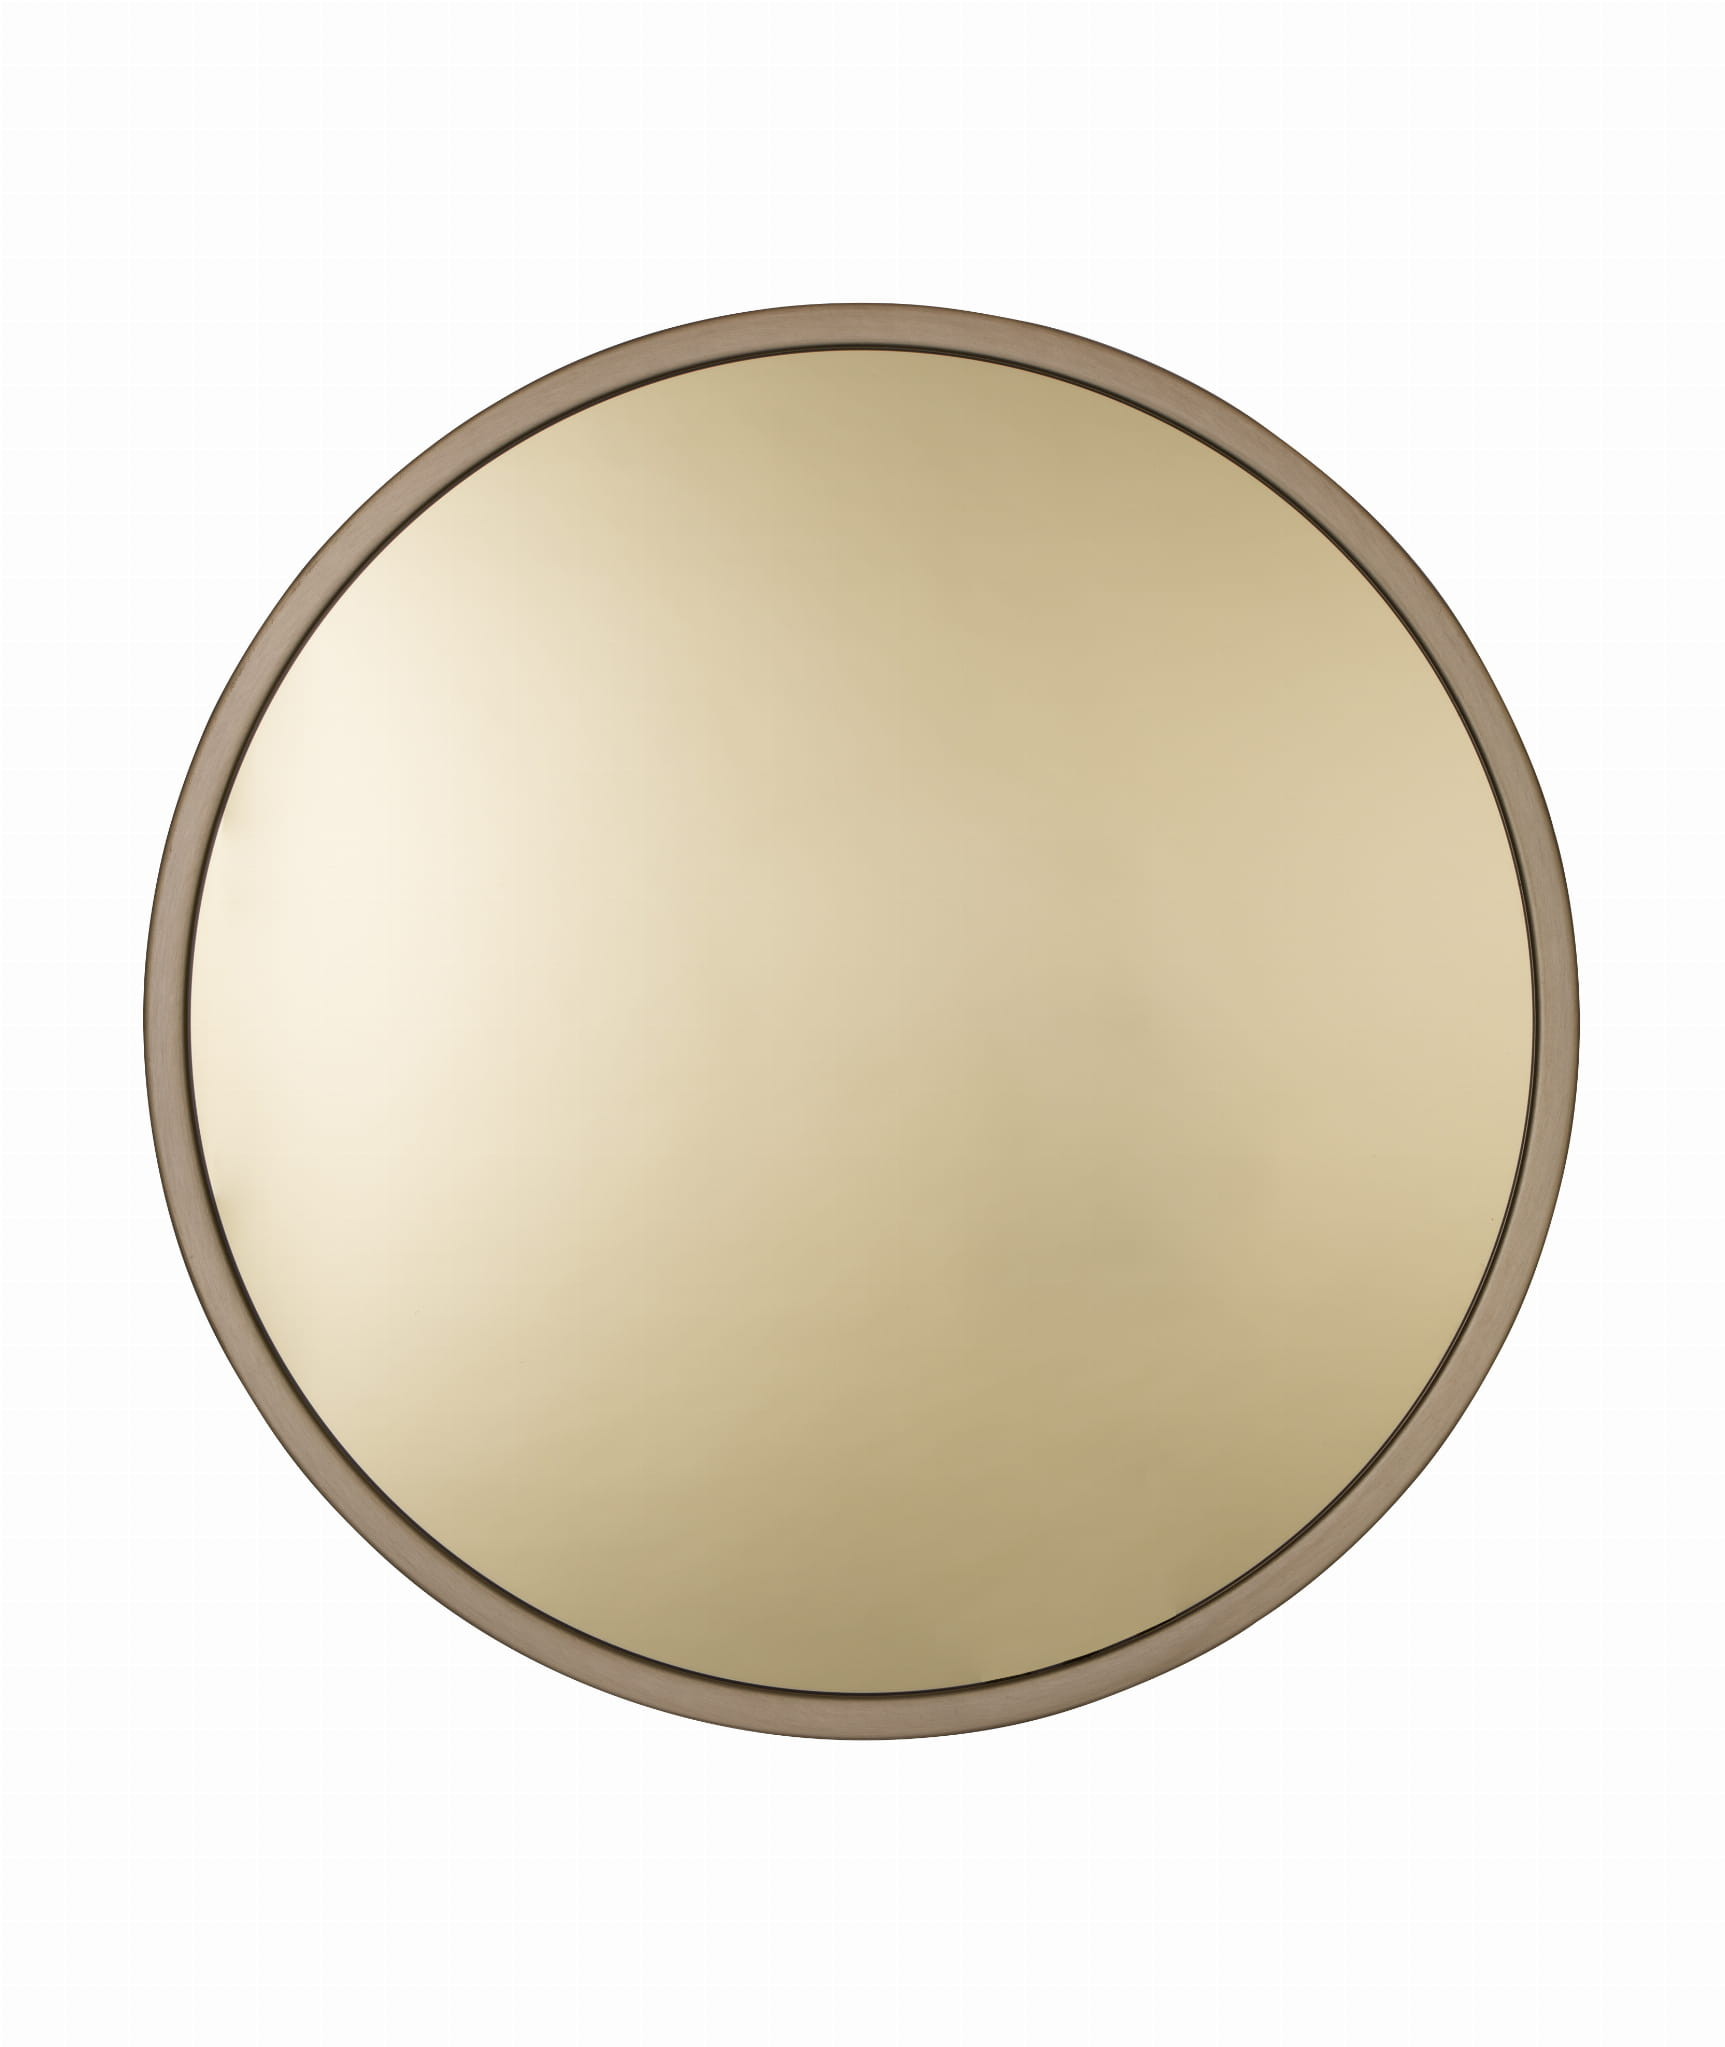 Dodatkowe Lustro Bandit złote - ZUIVER cobostore SS51